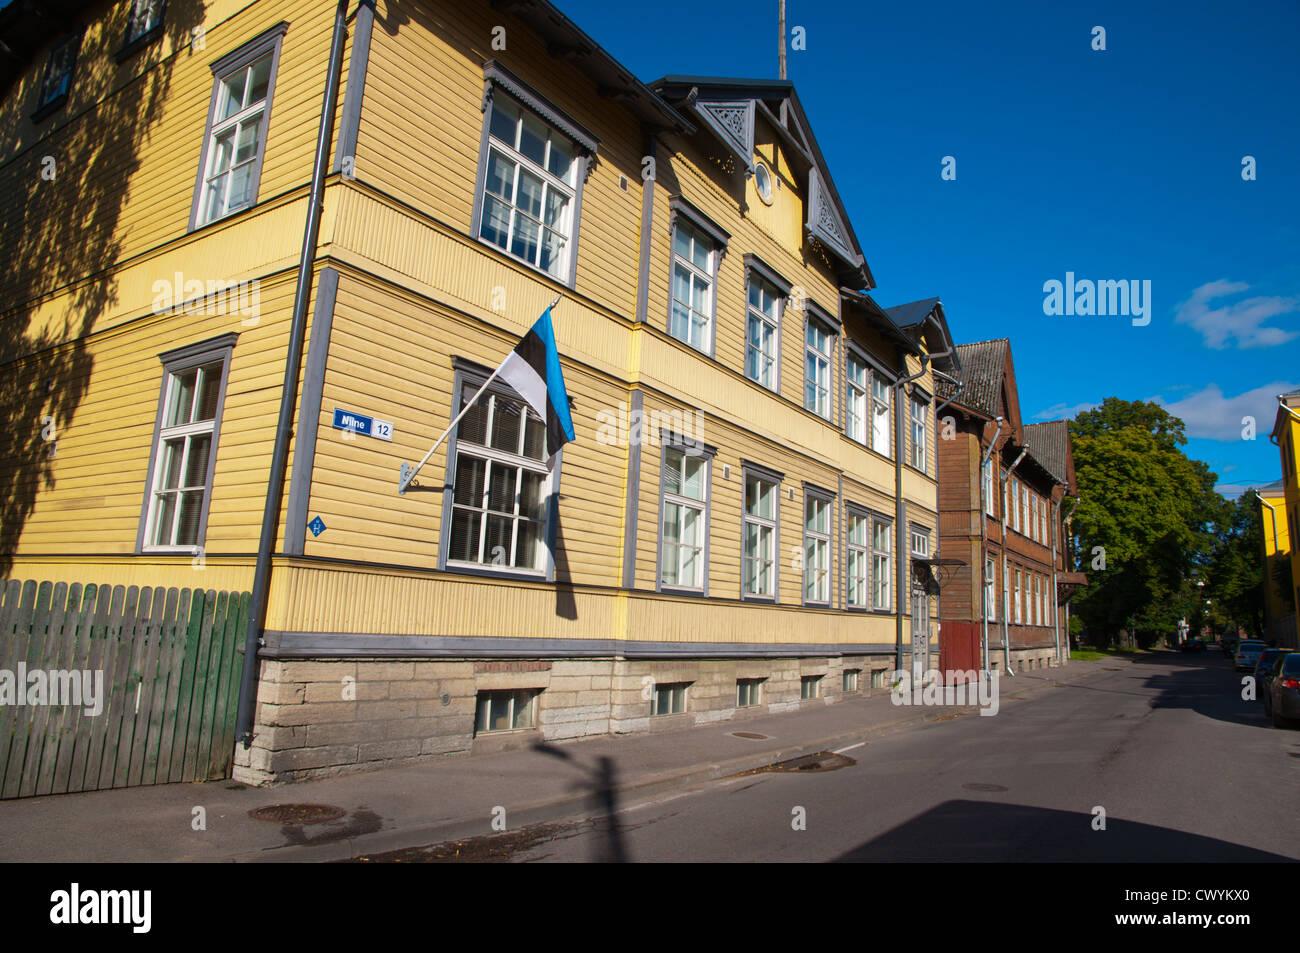 9da0623a44a Niine street Kalamaja district Tallinn Estonia Europe - Stock Image